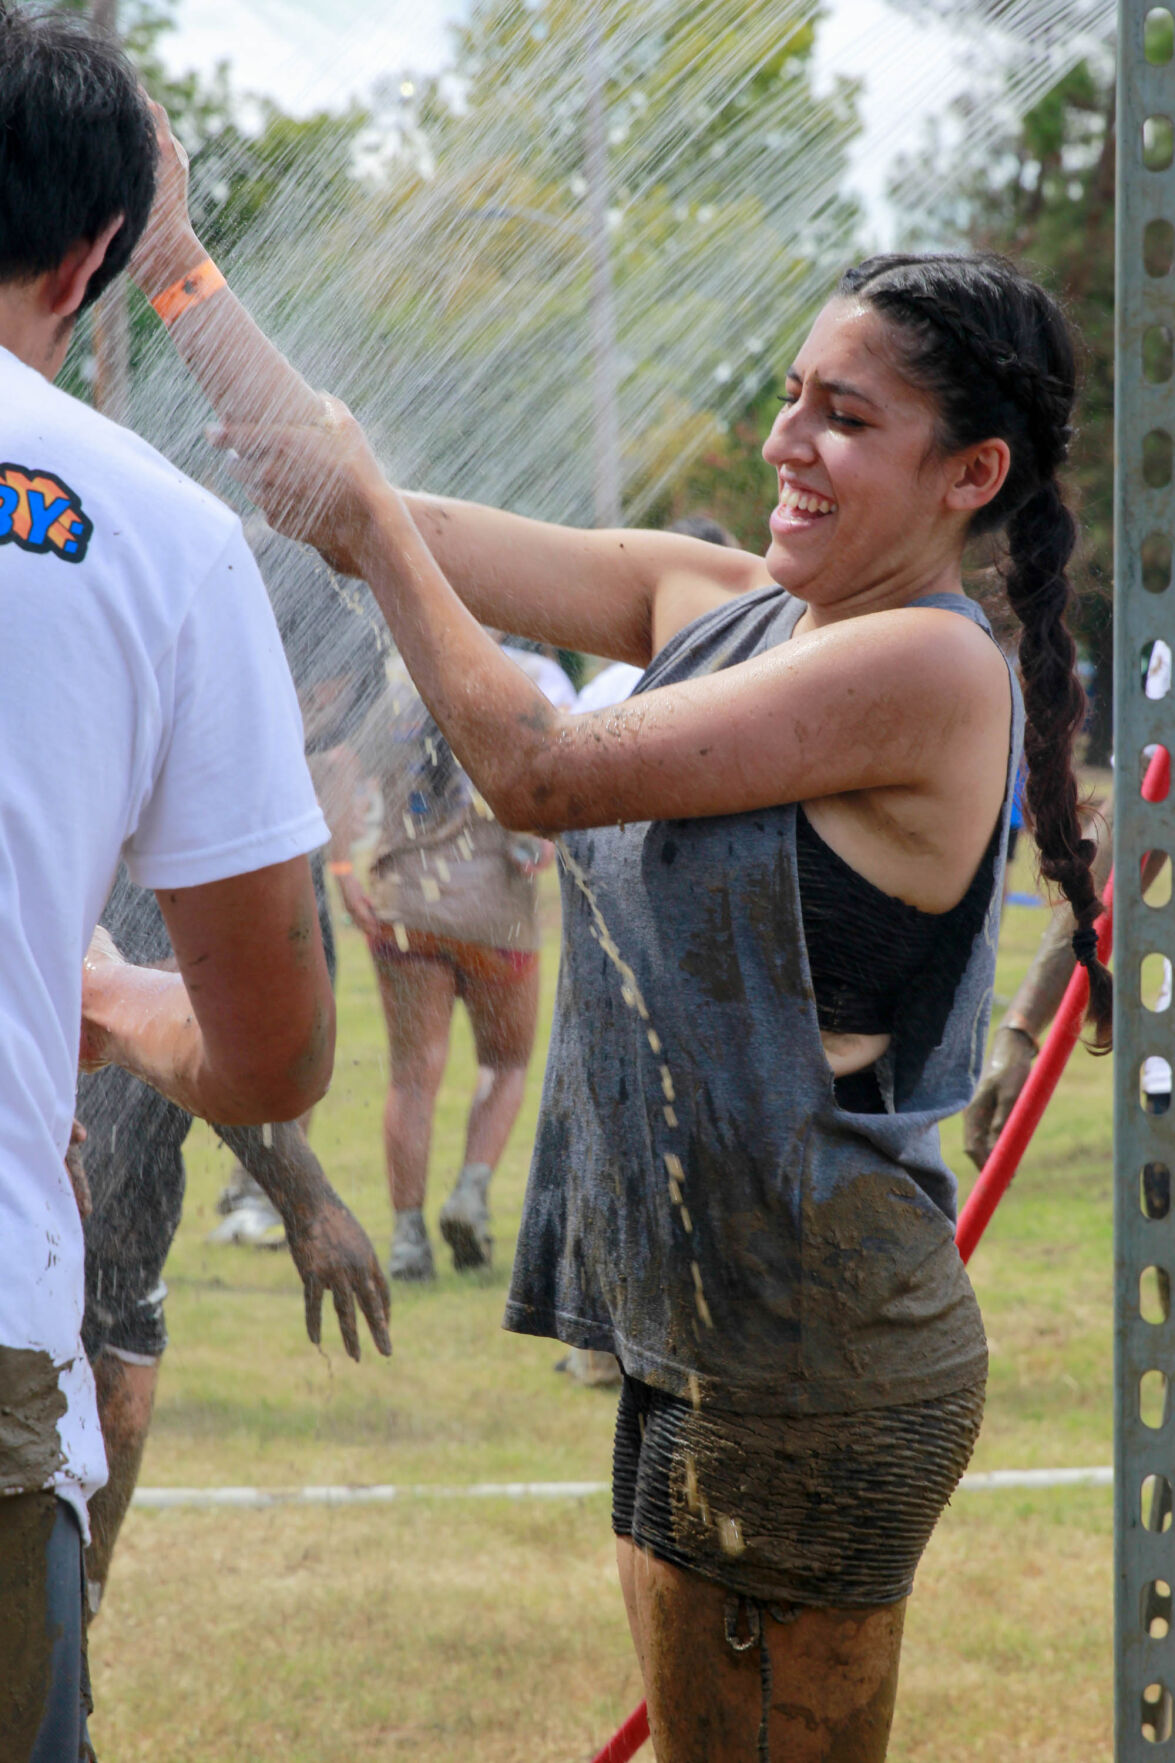 Photos: The return of Oozeball, UTA's muddiest tradition